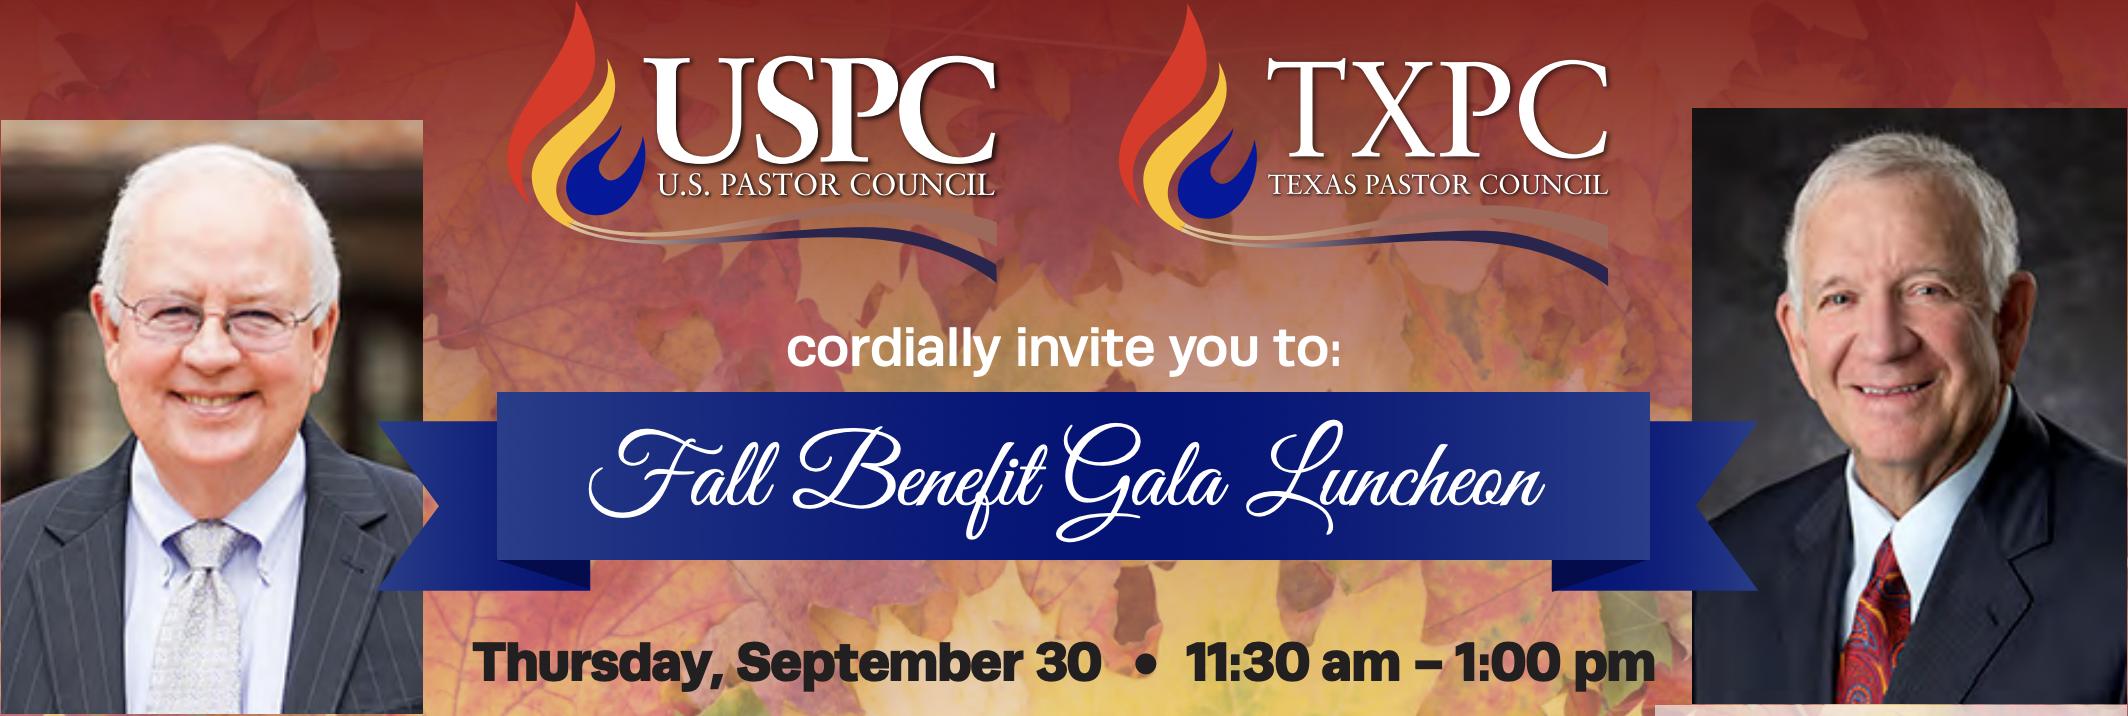 2021 Fall Benefit Gala Luncheon